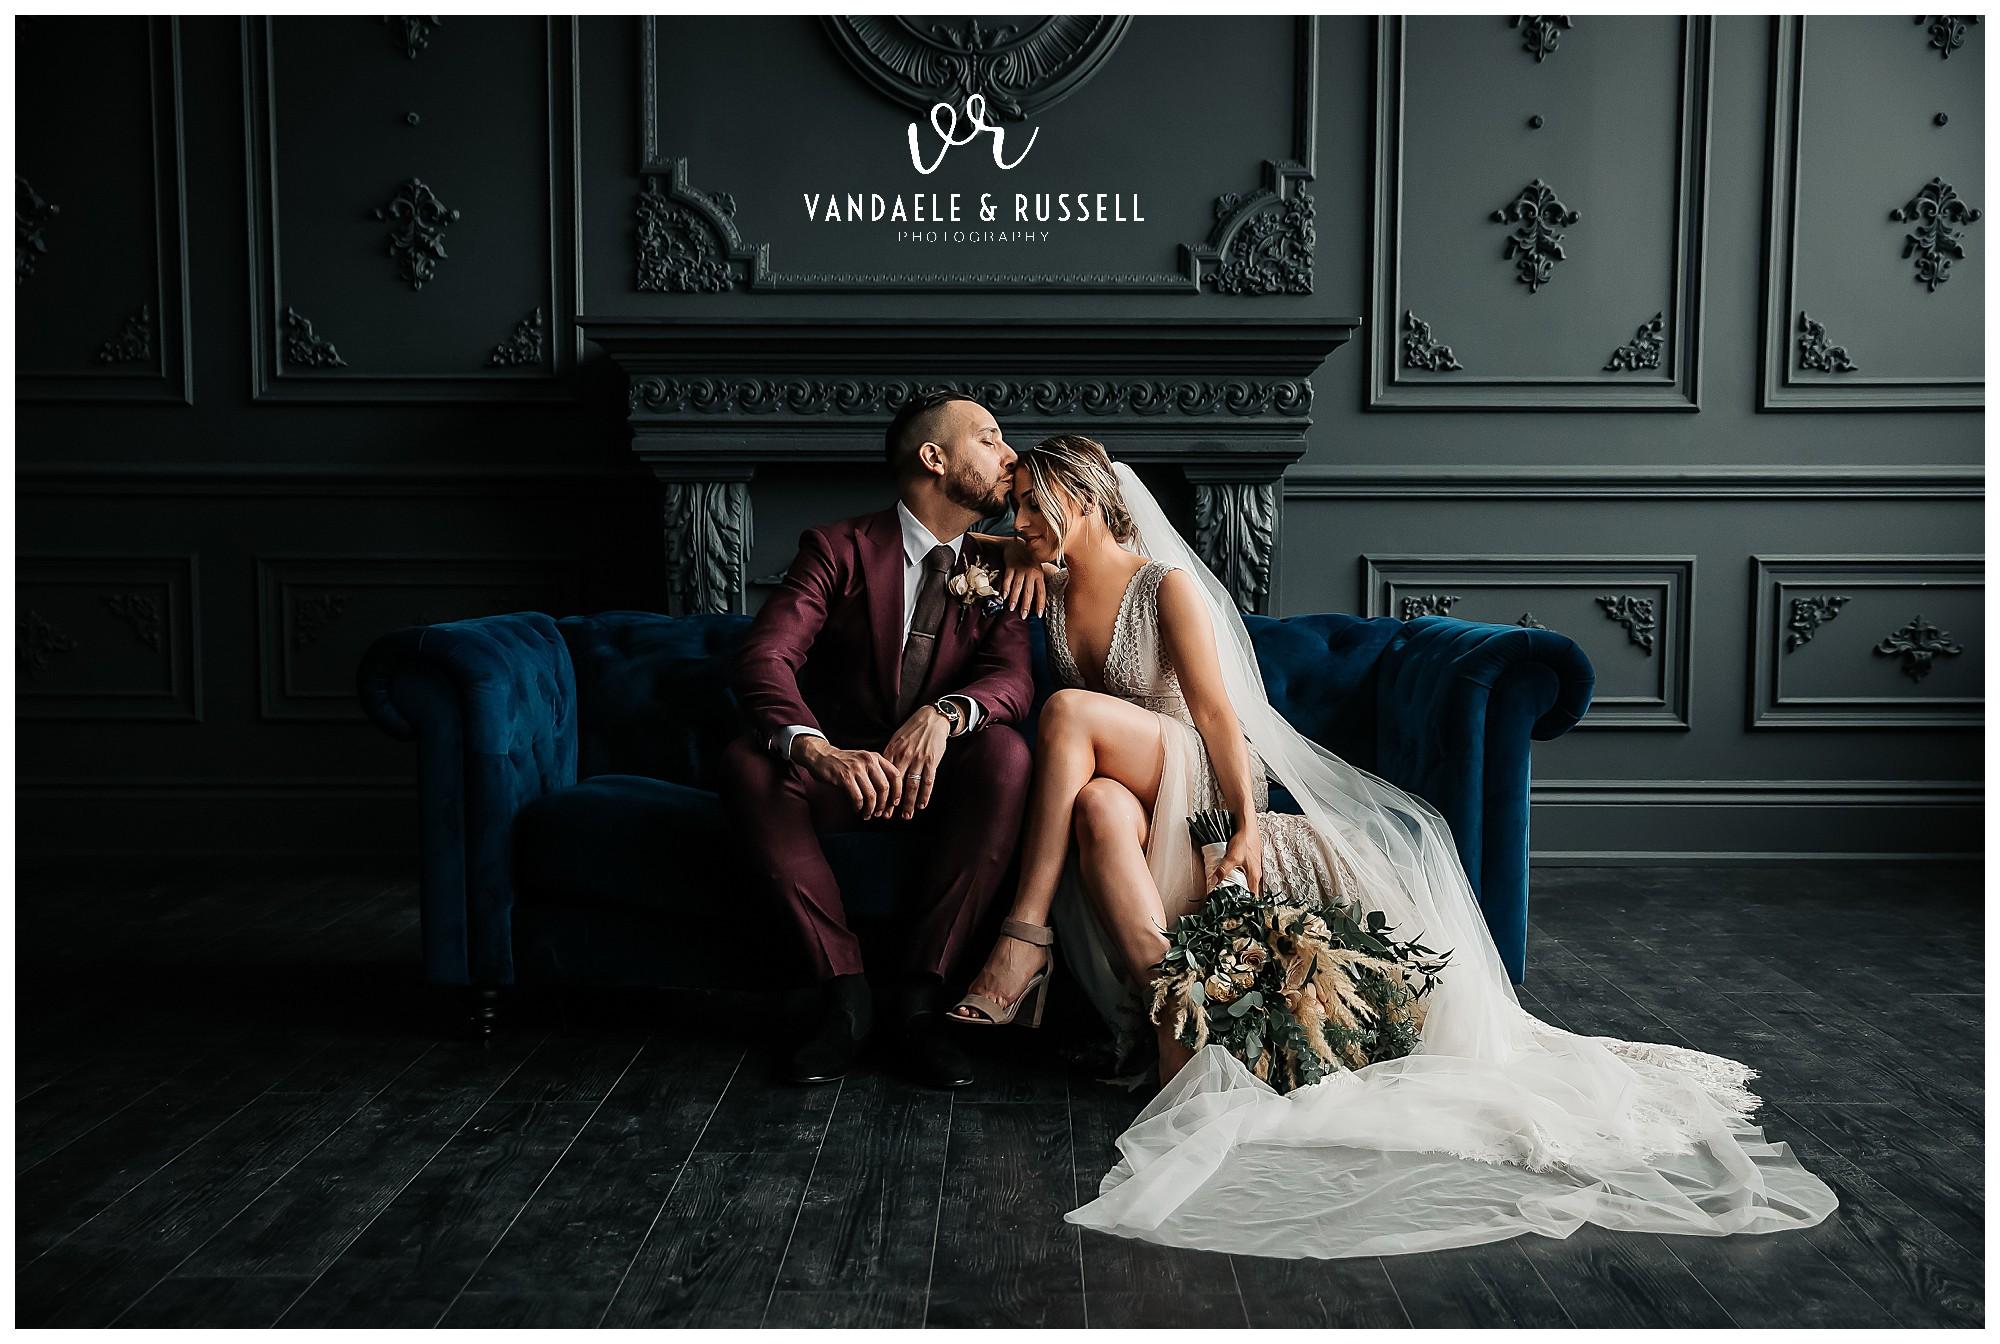 Joanna-Christos-Grand-Luxe-Wedding-Photos-Mint-Room-Toronto-VanDaele-Russell_0053.jpg